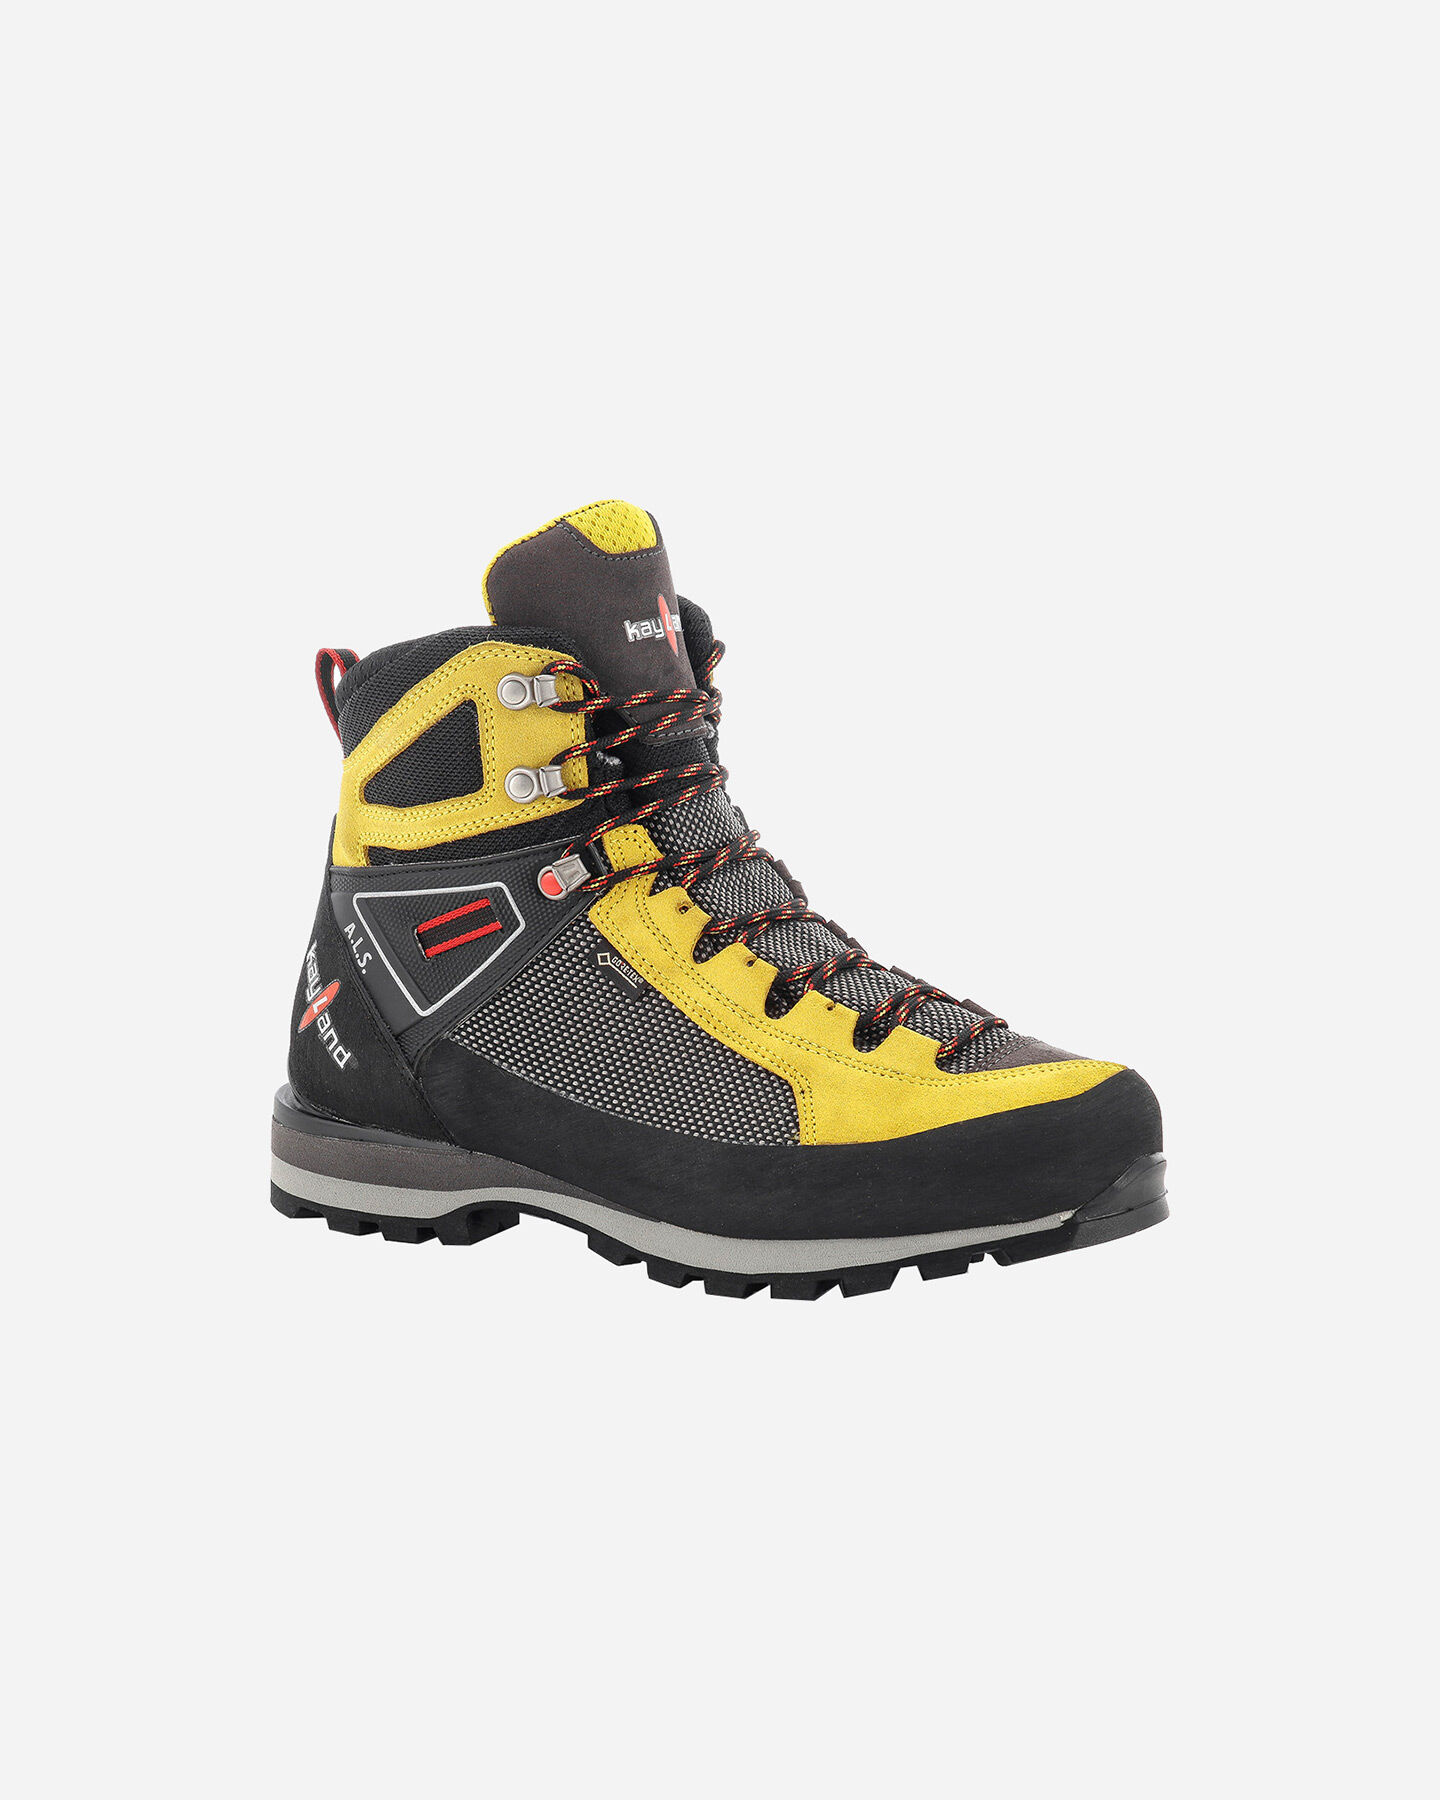 Scarpe alpinismo KAYLAND CROSS MOUNTAIN GTX M S4096136 scatto 1